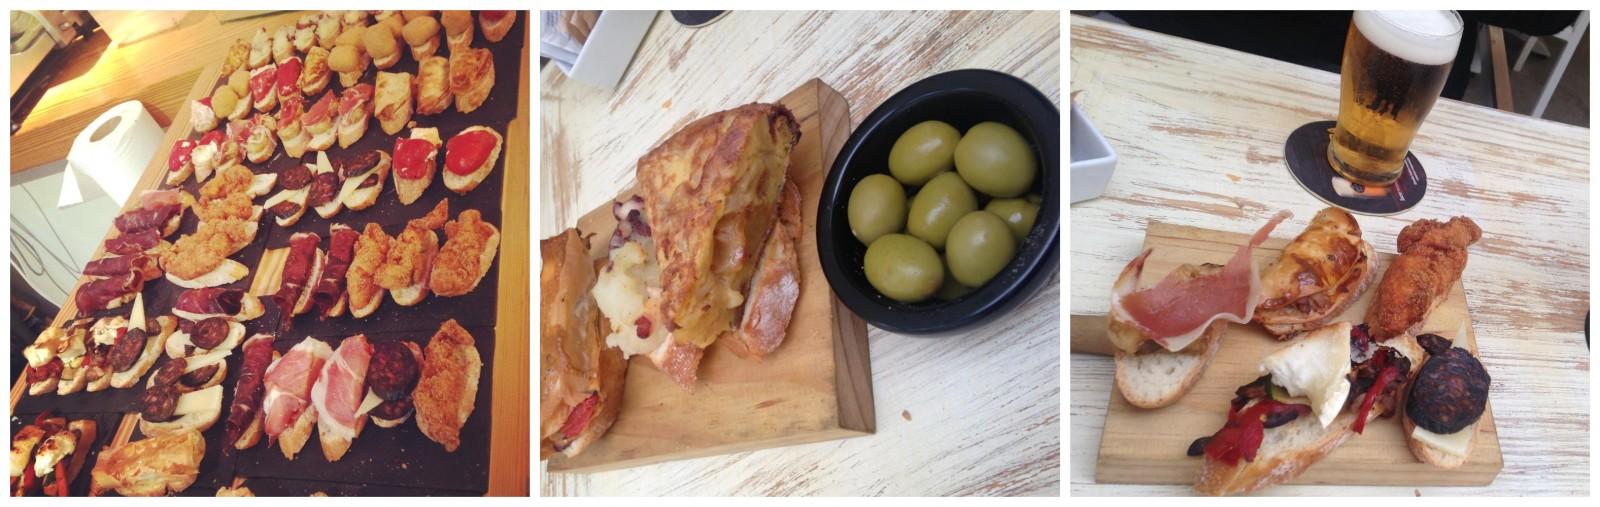 Tapas bar Ibiza Town Sandwiches Beer Restaurant